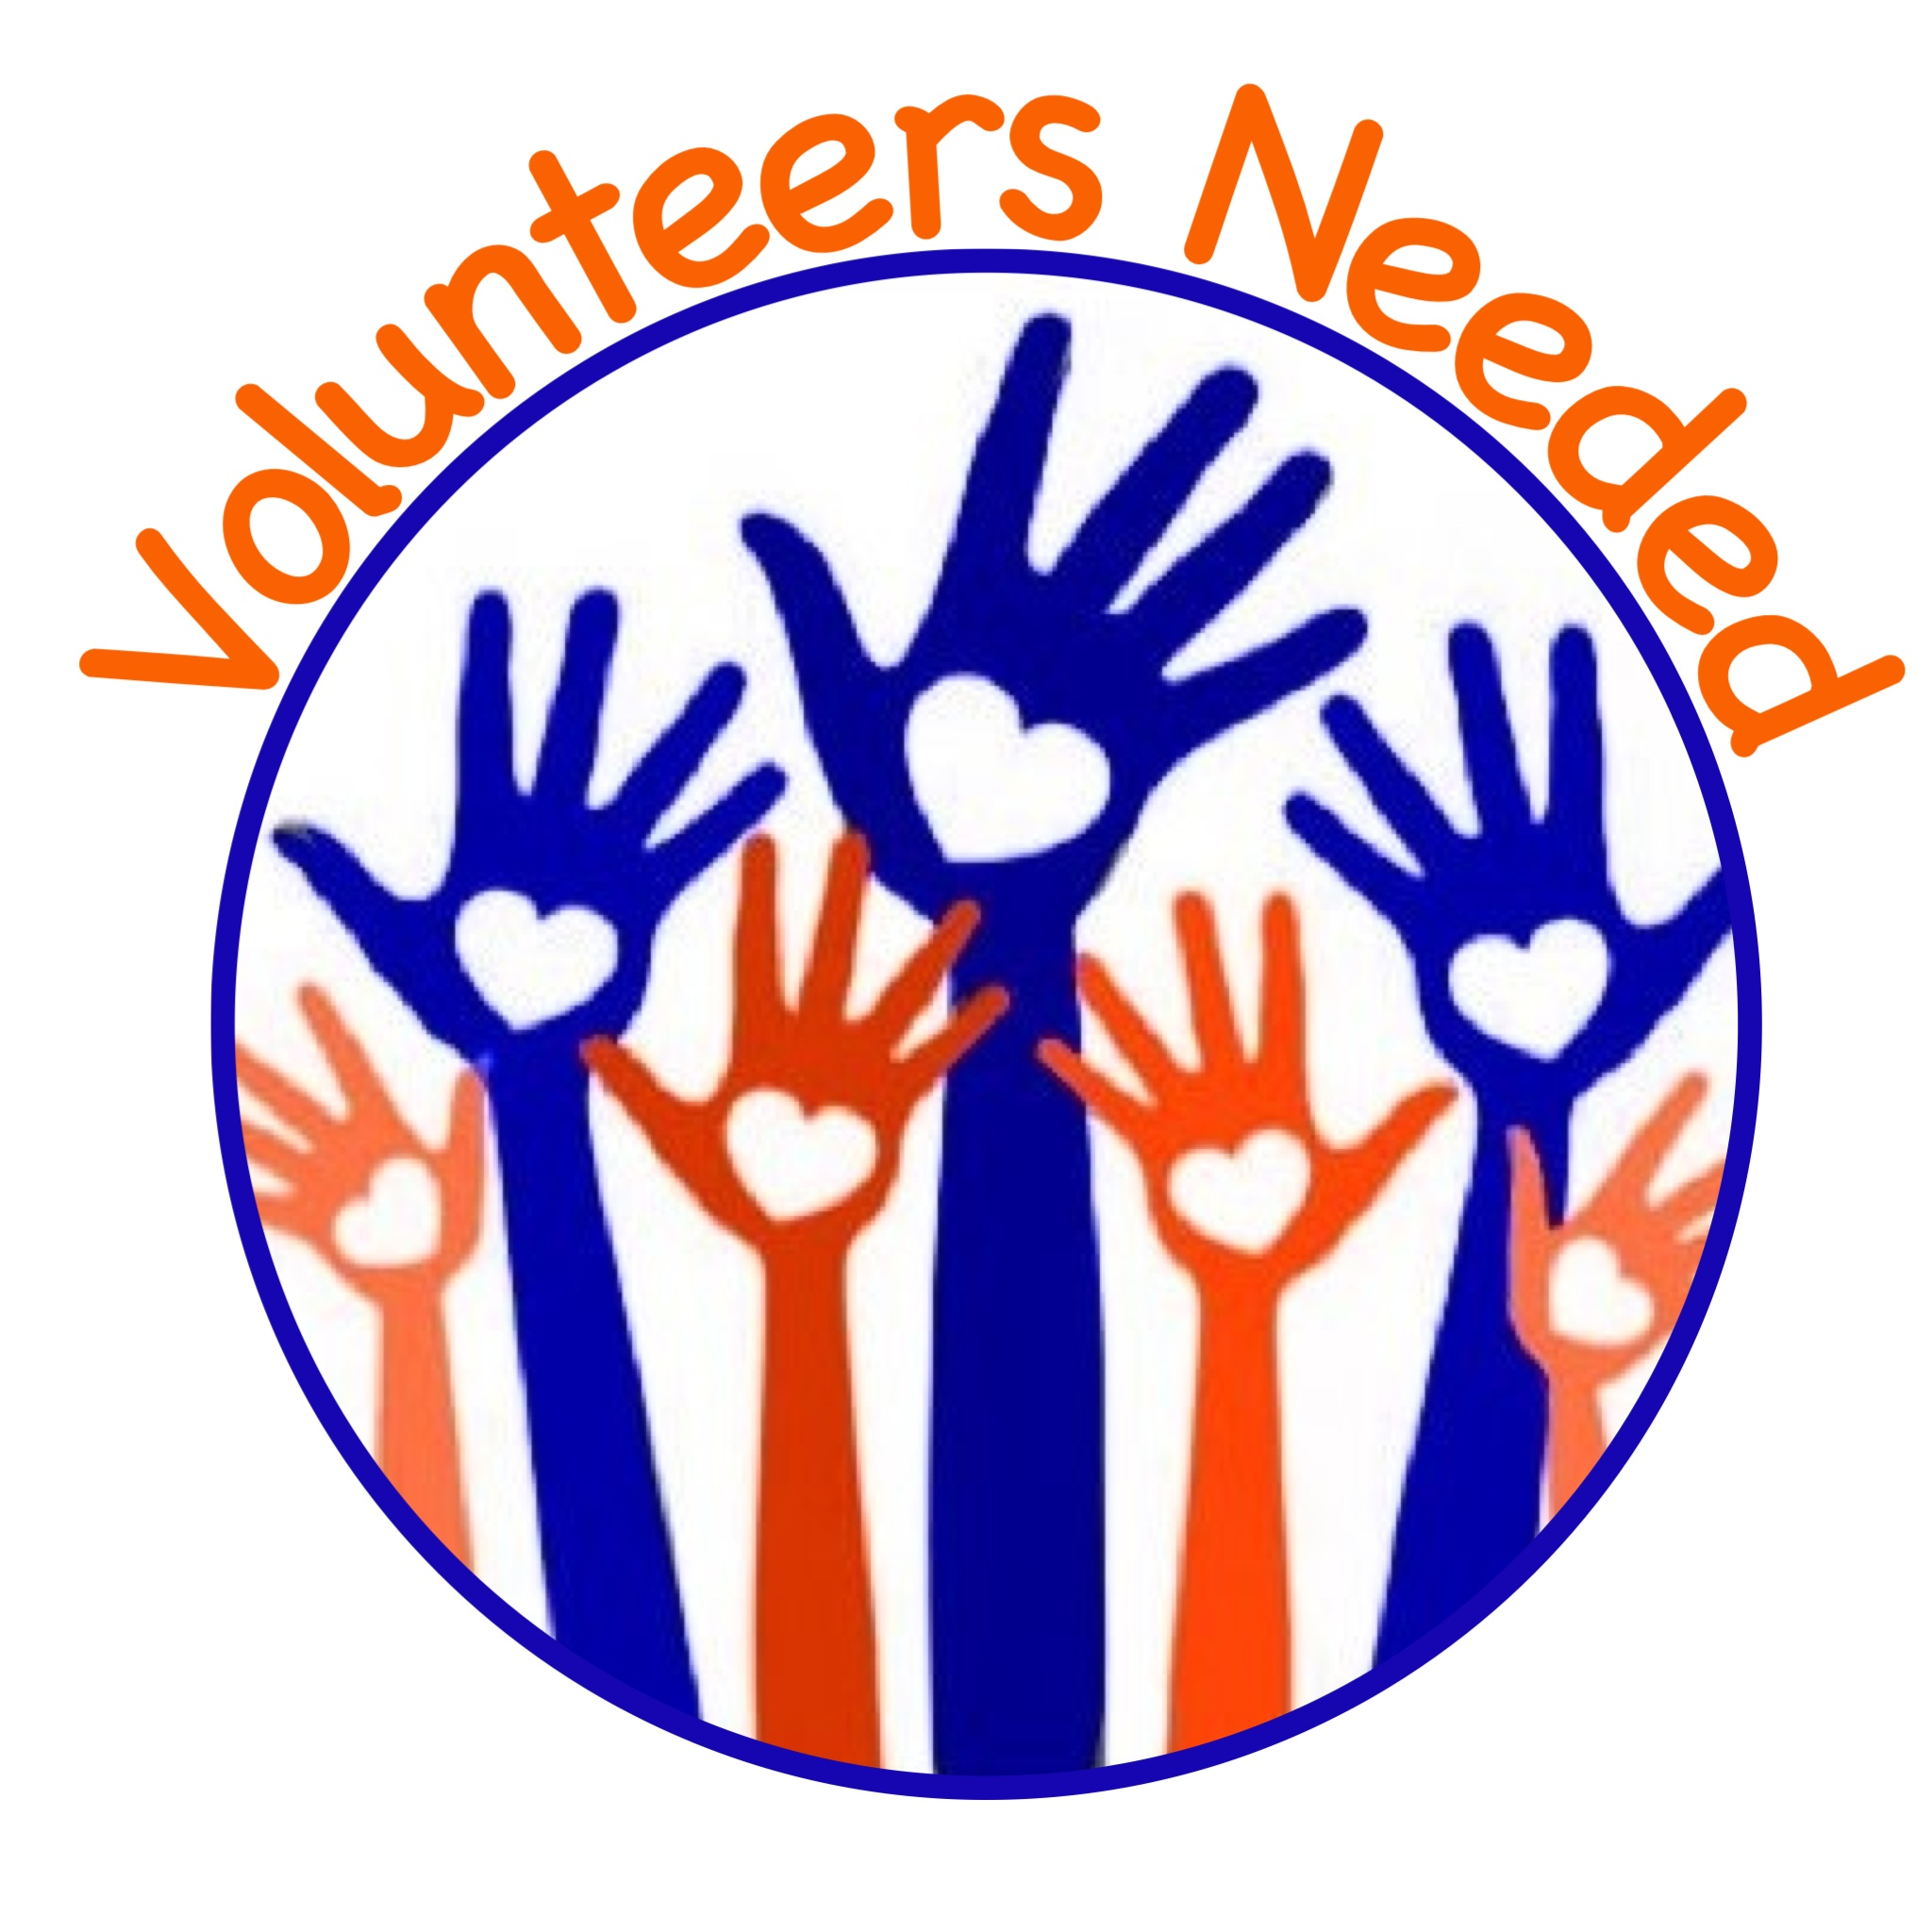 clip library stock  volunteers needed clipartlook. Volunteering clipart food pantry